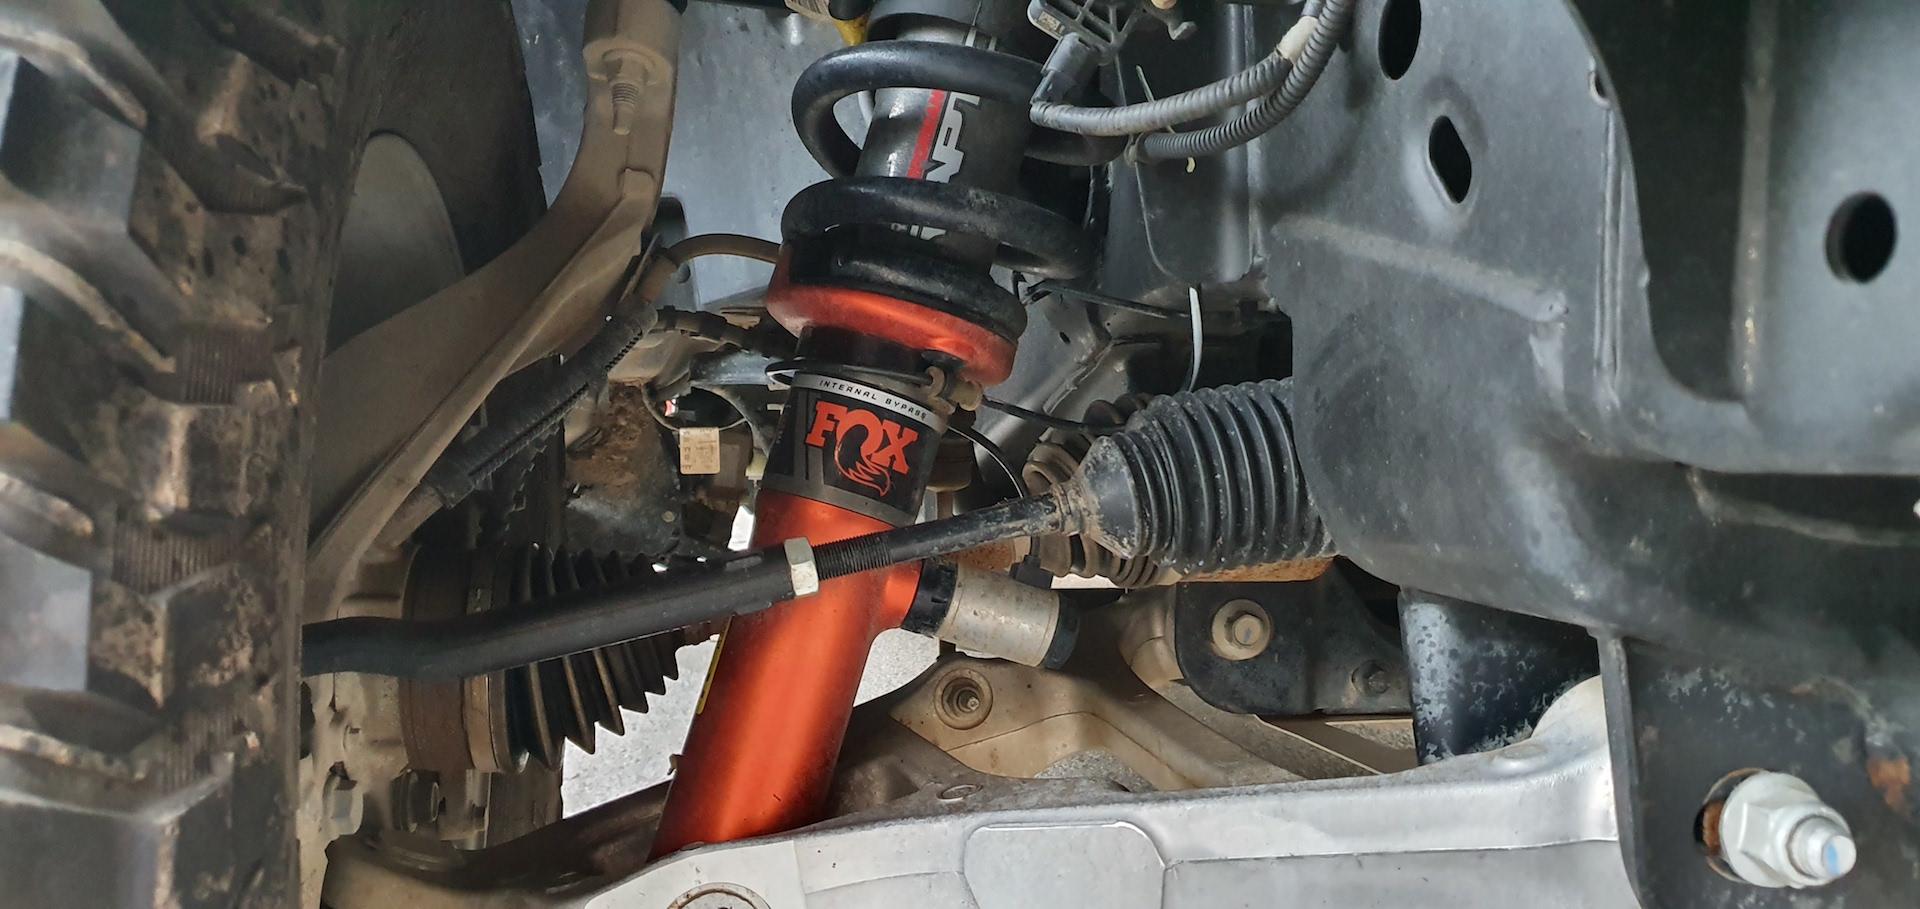 FORD F150 Shelby baja raptor v6 3.5l bva10 525hp